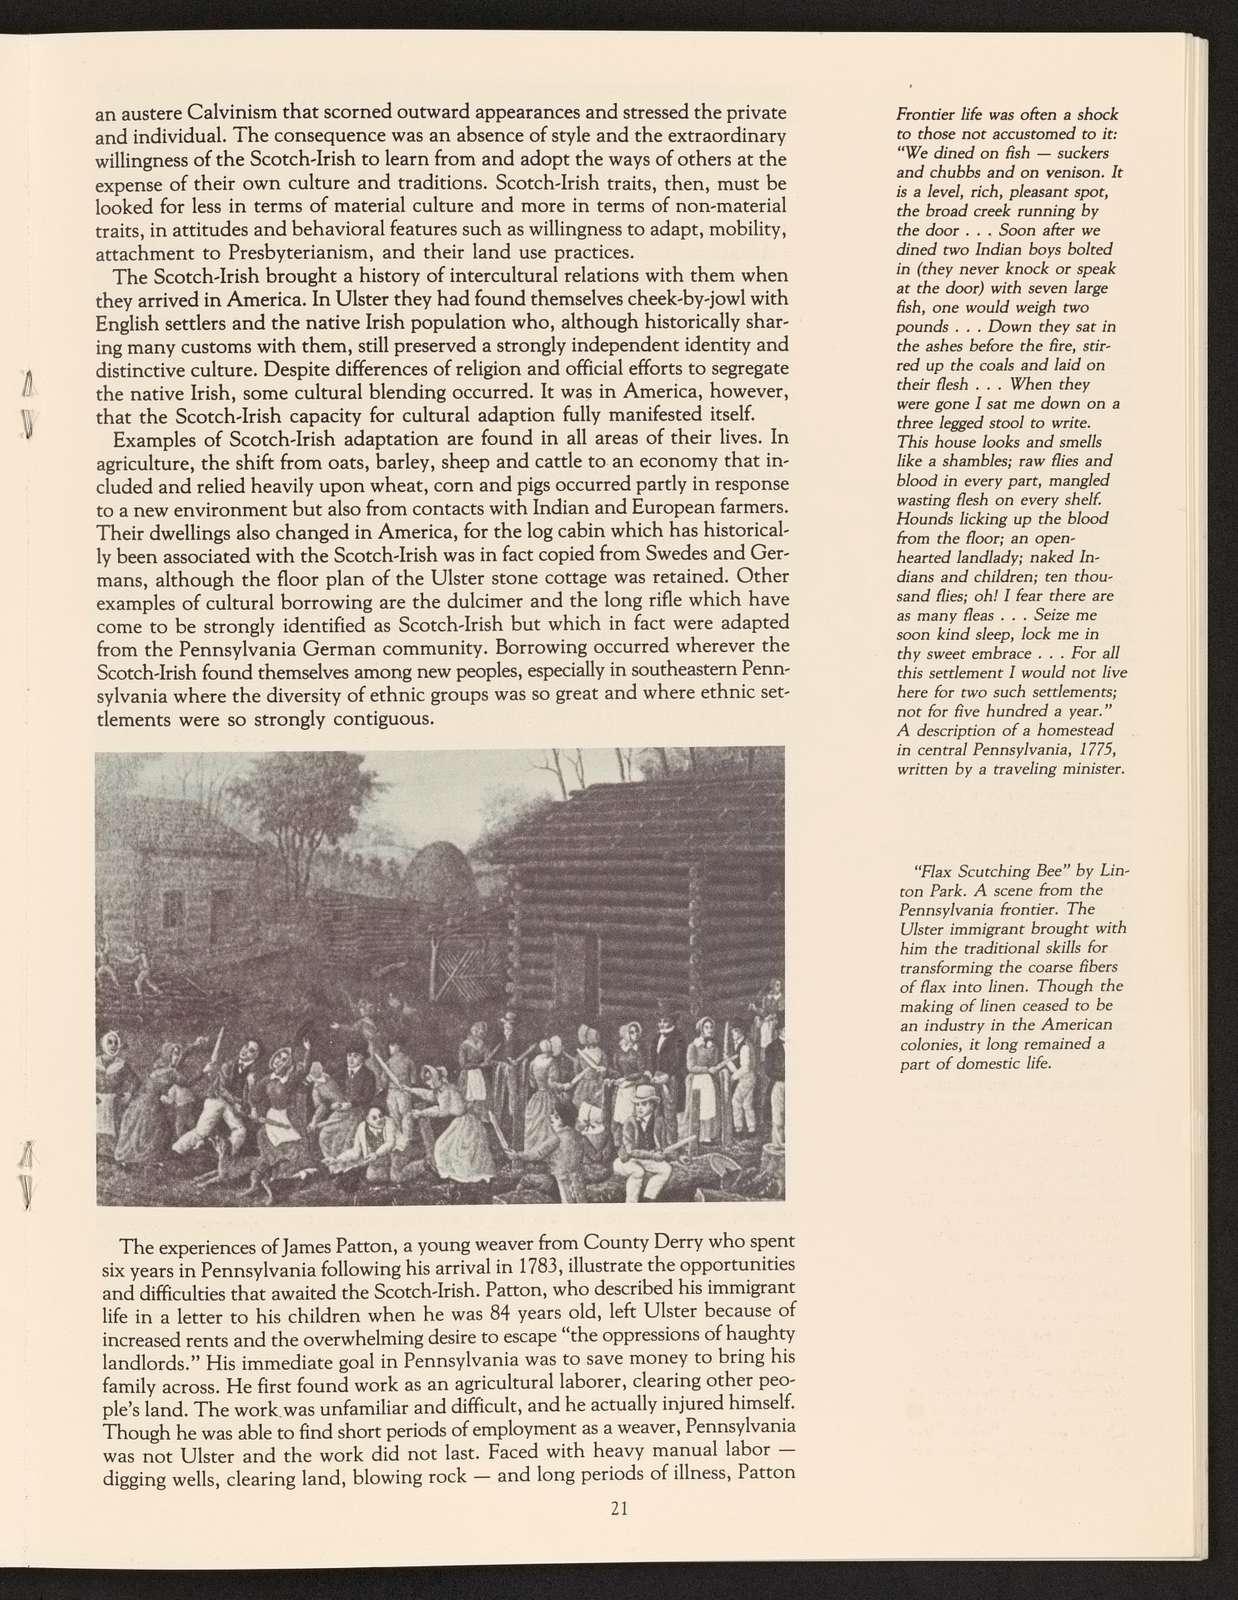 Alan Lomax Collection, Manuscripts, Big Ballad Book, 1961-1991